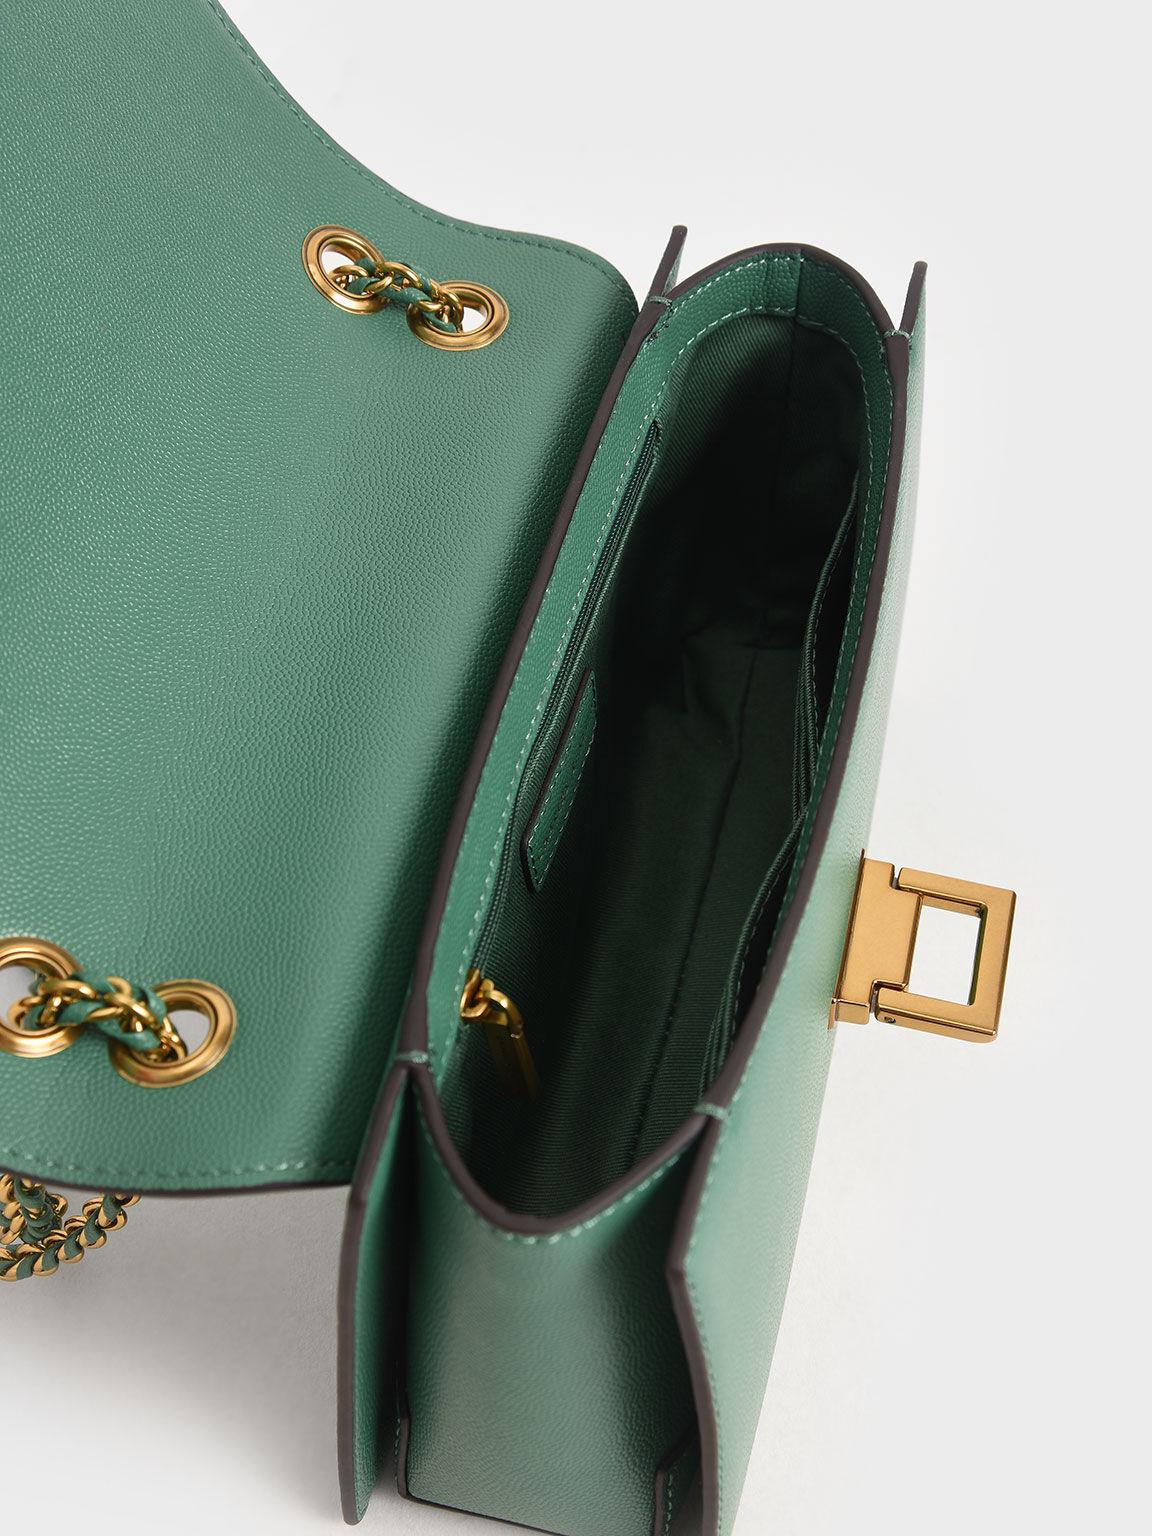 鍊條金釦肩背包, 綠色, hi-res